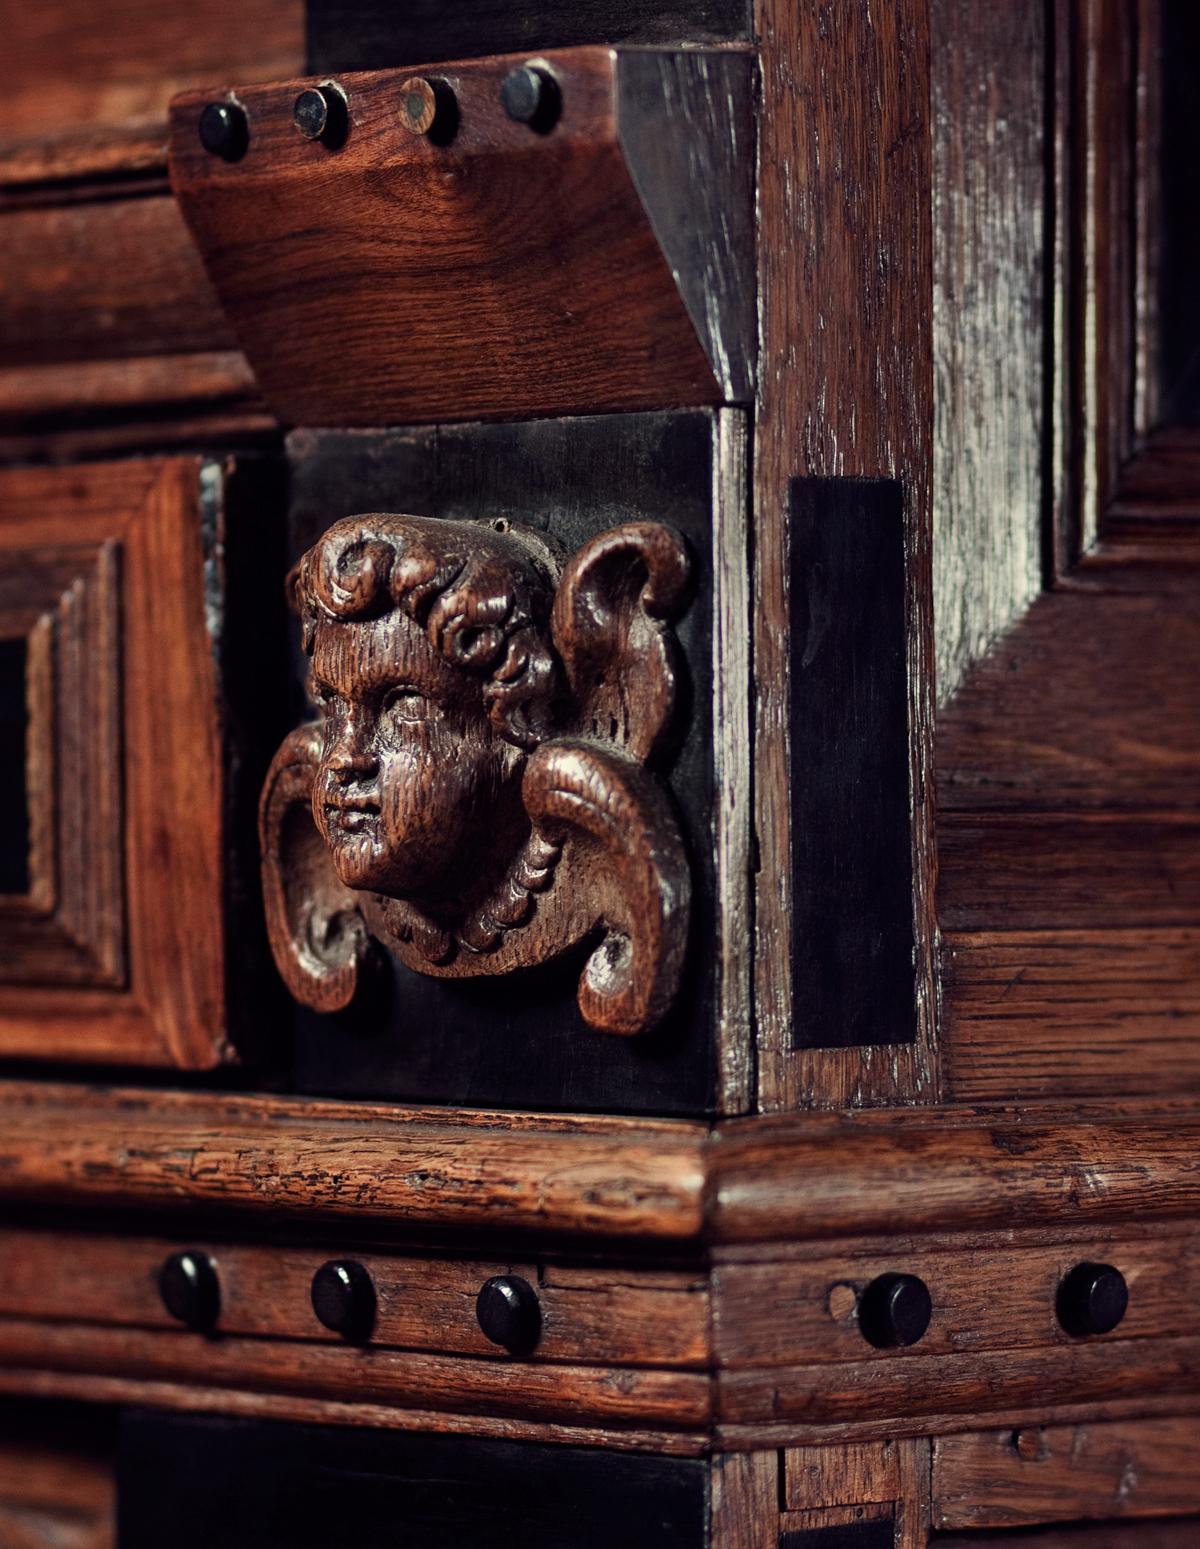 Veilinghuis Antieke Meubelen.Goedkoop Antiek Kastje Gekocht Cultuur Cocktail